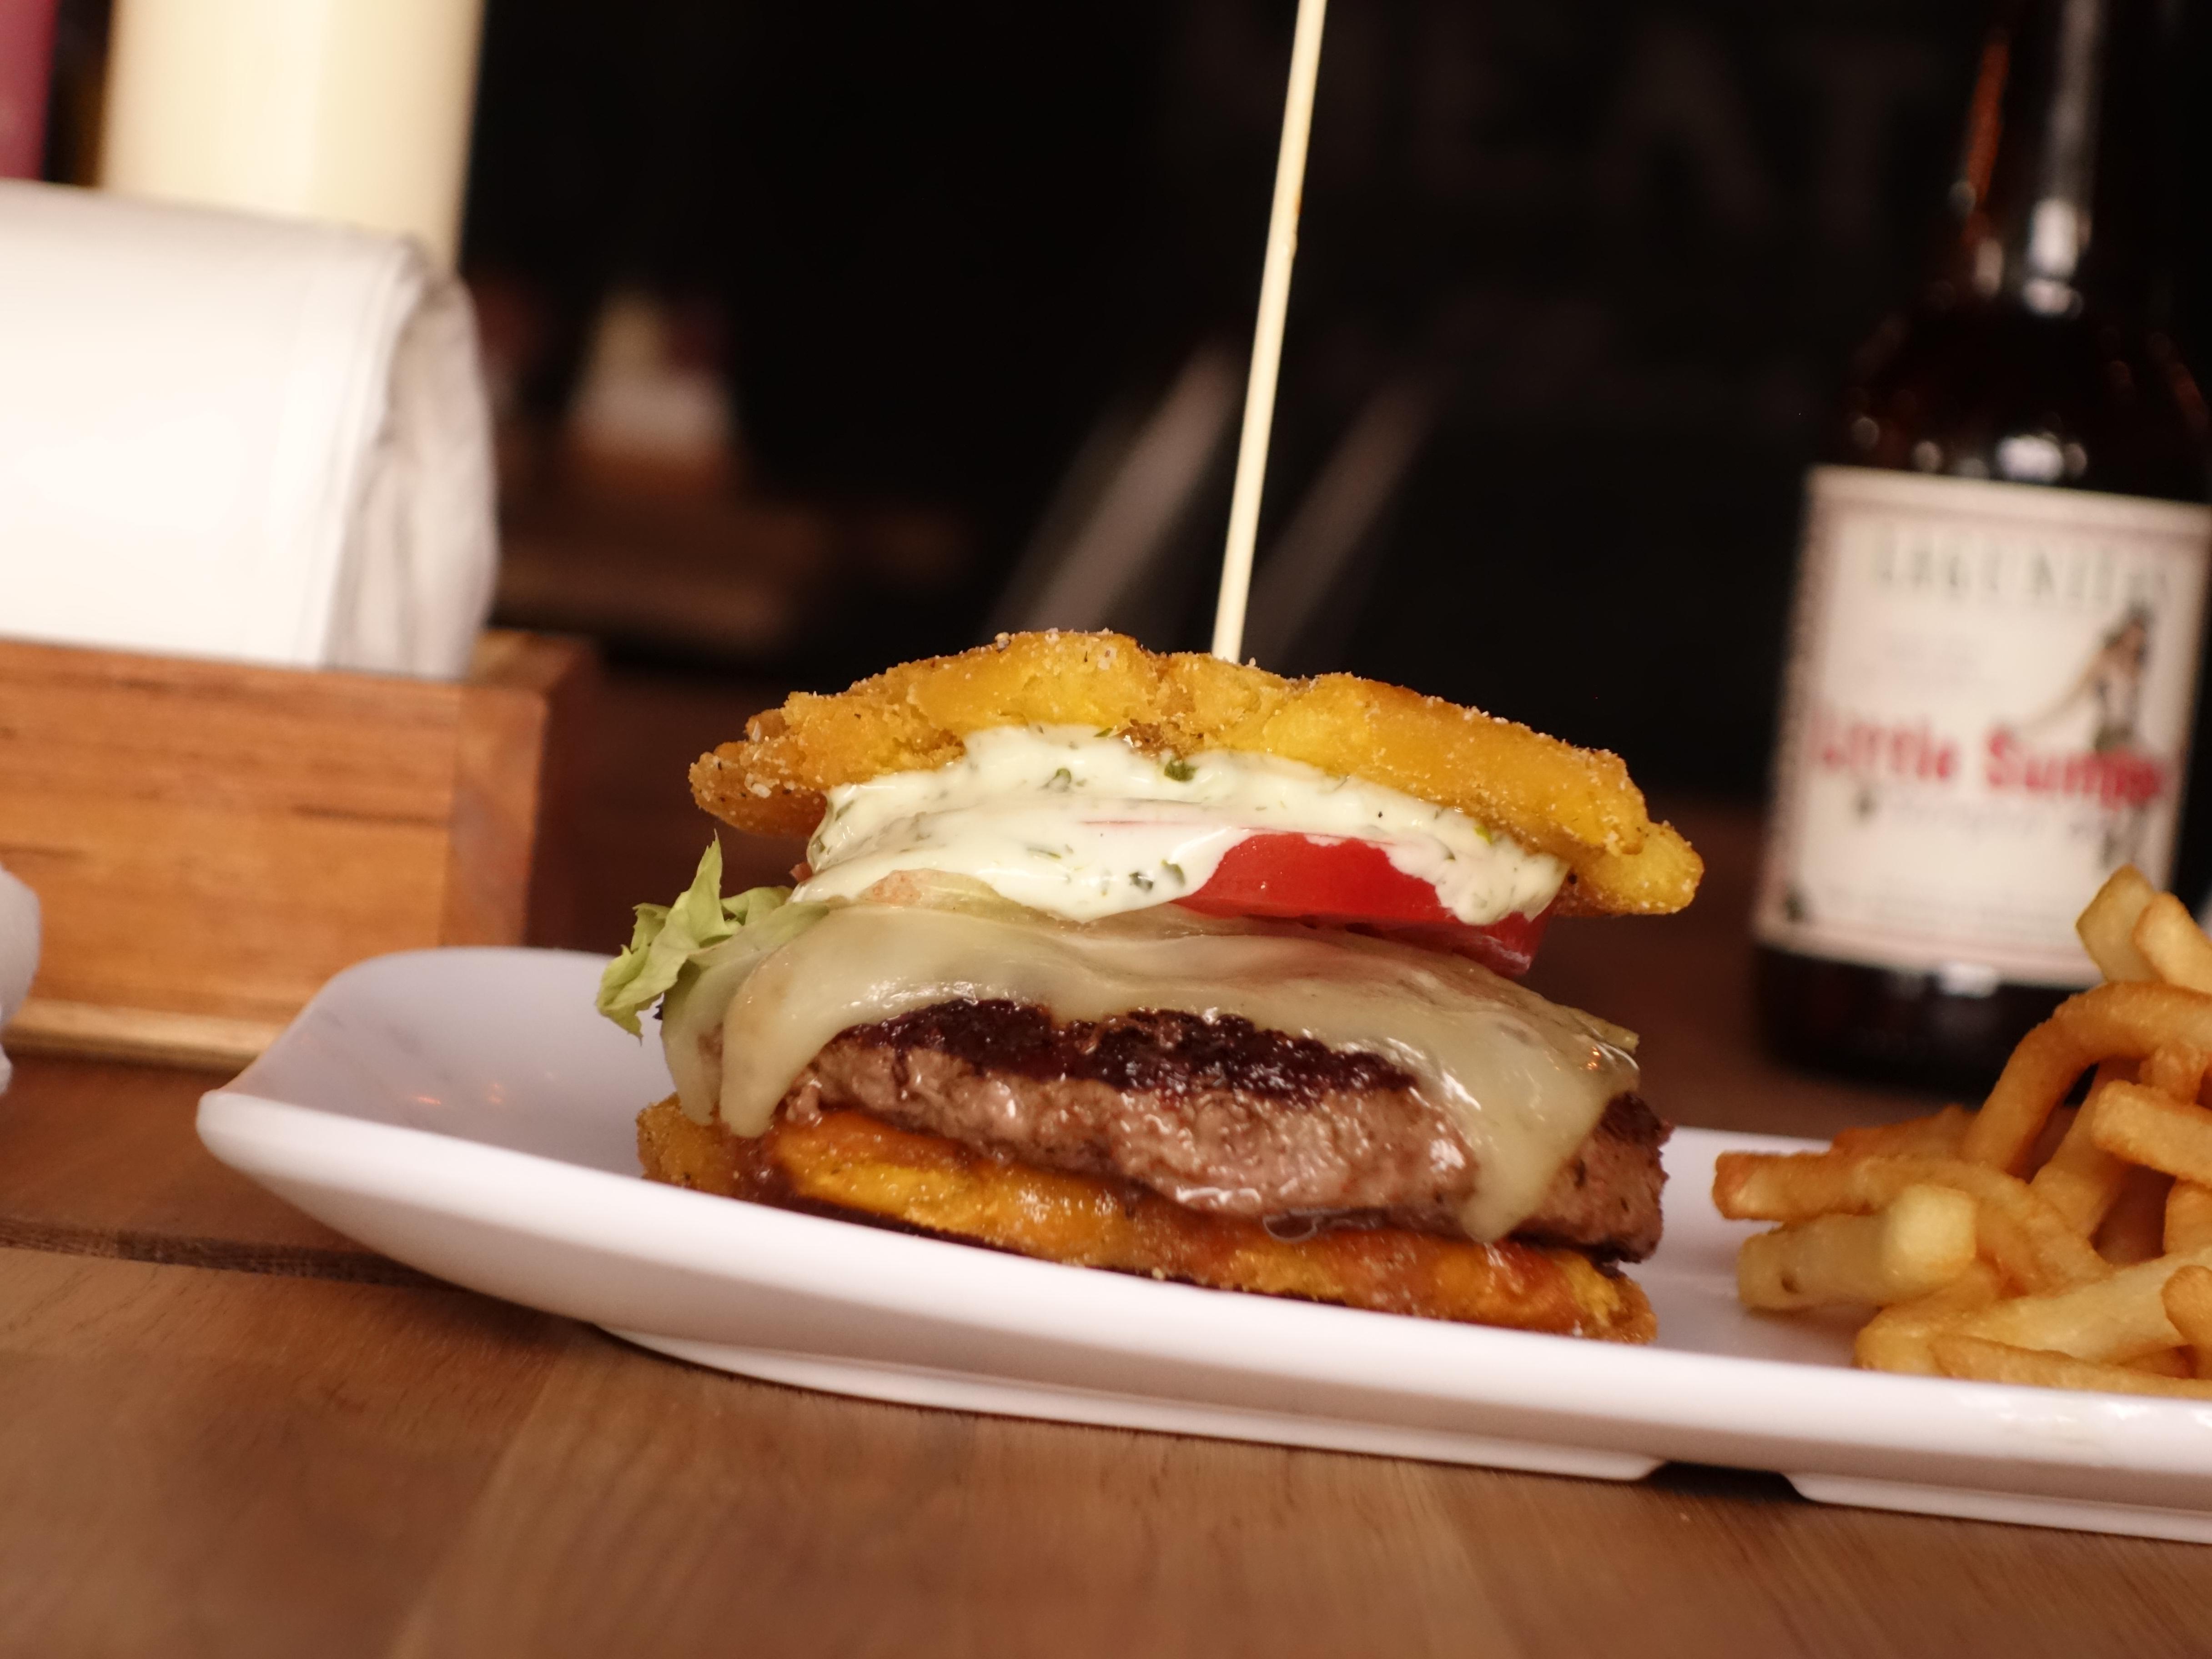 south florida u0027s best burgers 31burgers 31days